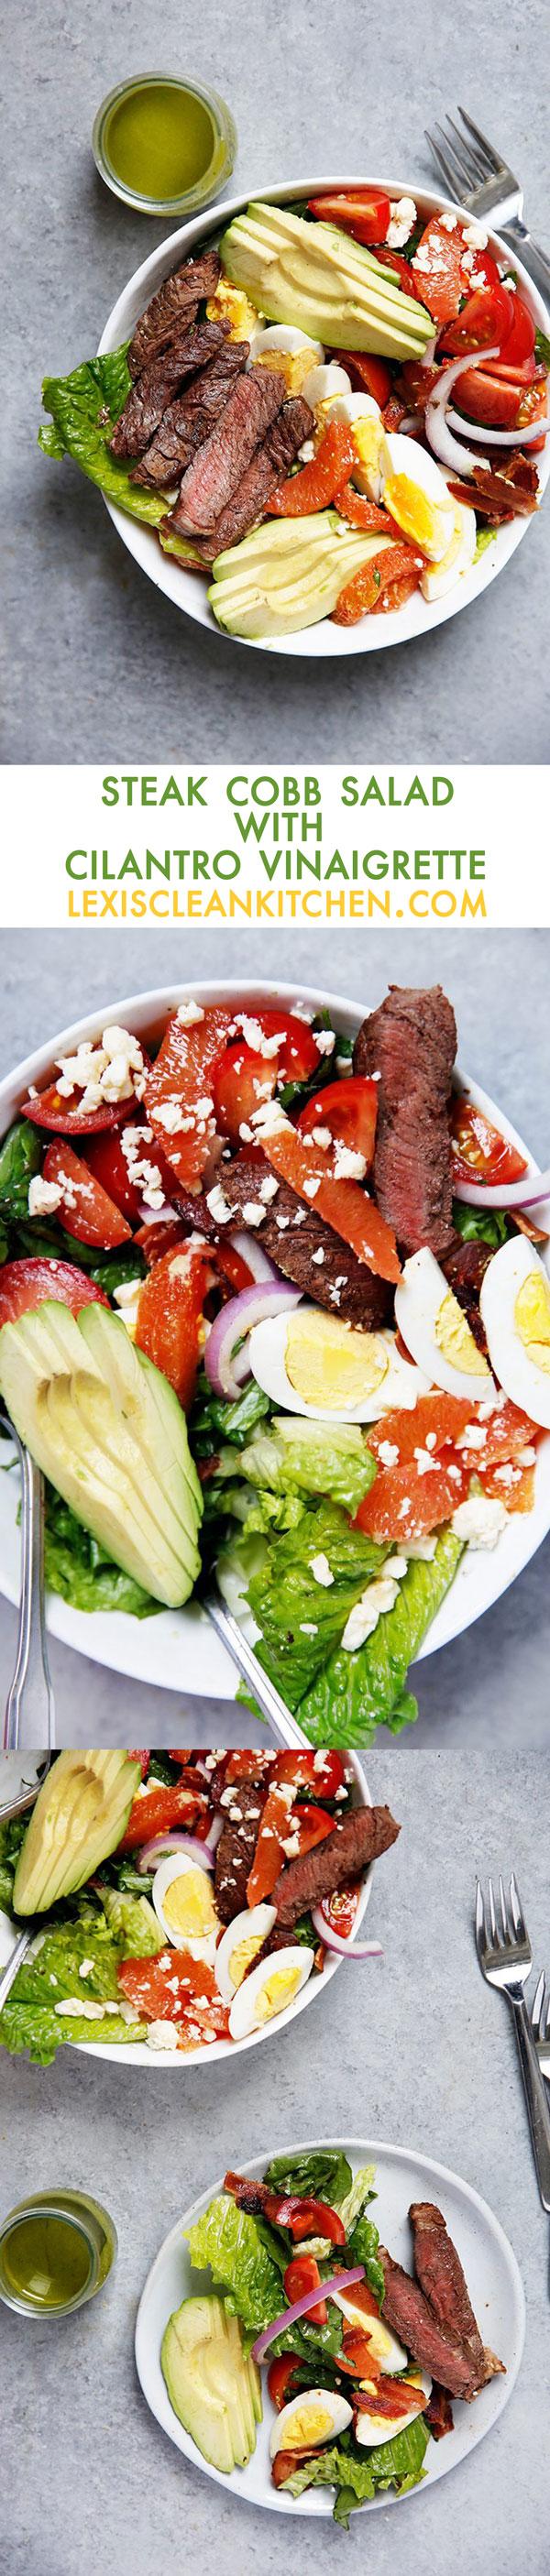 Steak Cobb Salad with Cilantro Vinaigrette {30 minutes or less, paleo friendly, gluten-free} | Lexi's Clean Kitchen